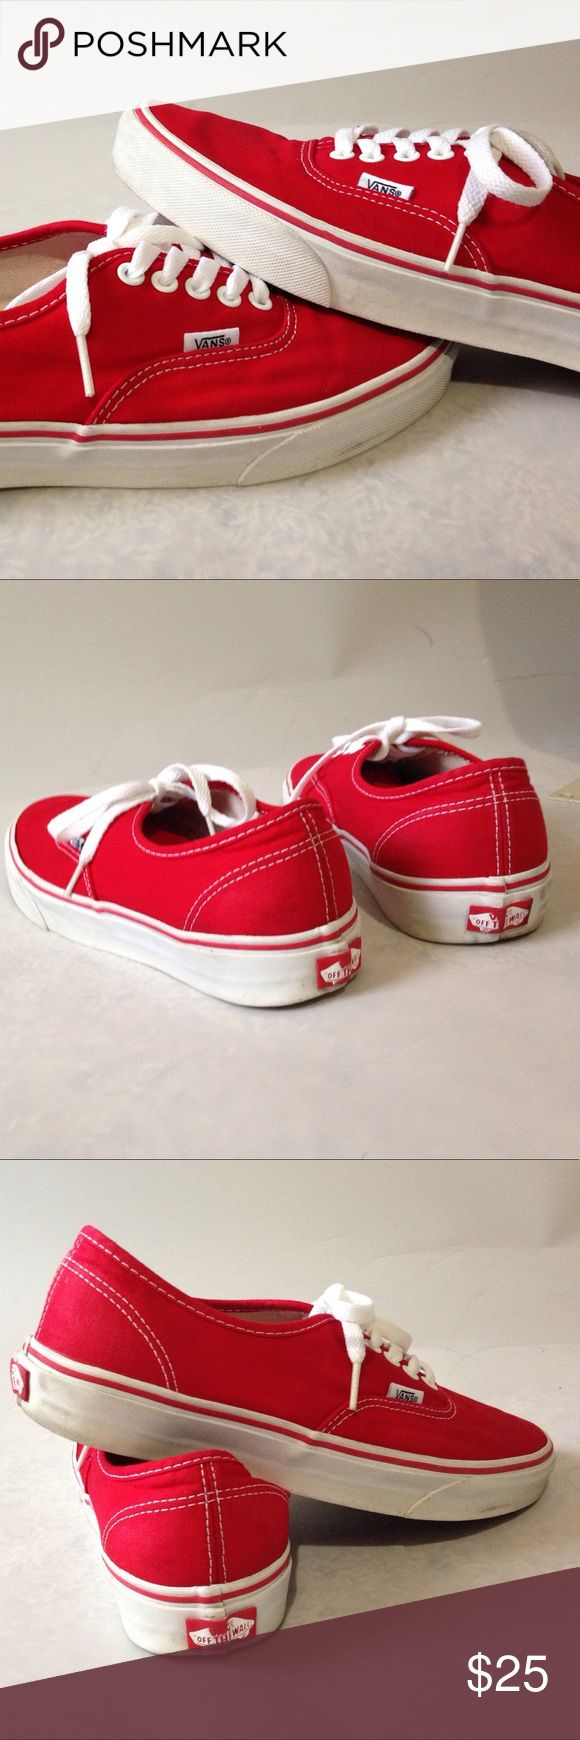 Vans red and white mens Sz 9, women's Sz 10.5 Vans authentic Red Mens/Women's. Mens size 9, women's size 10.5 Vans Shoes Athletic Shoes